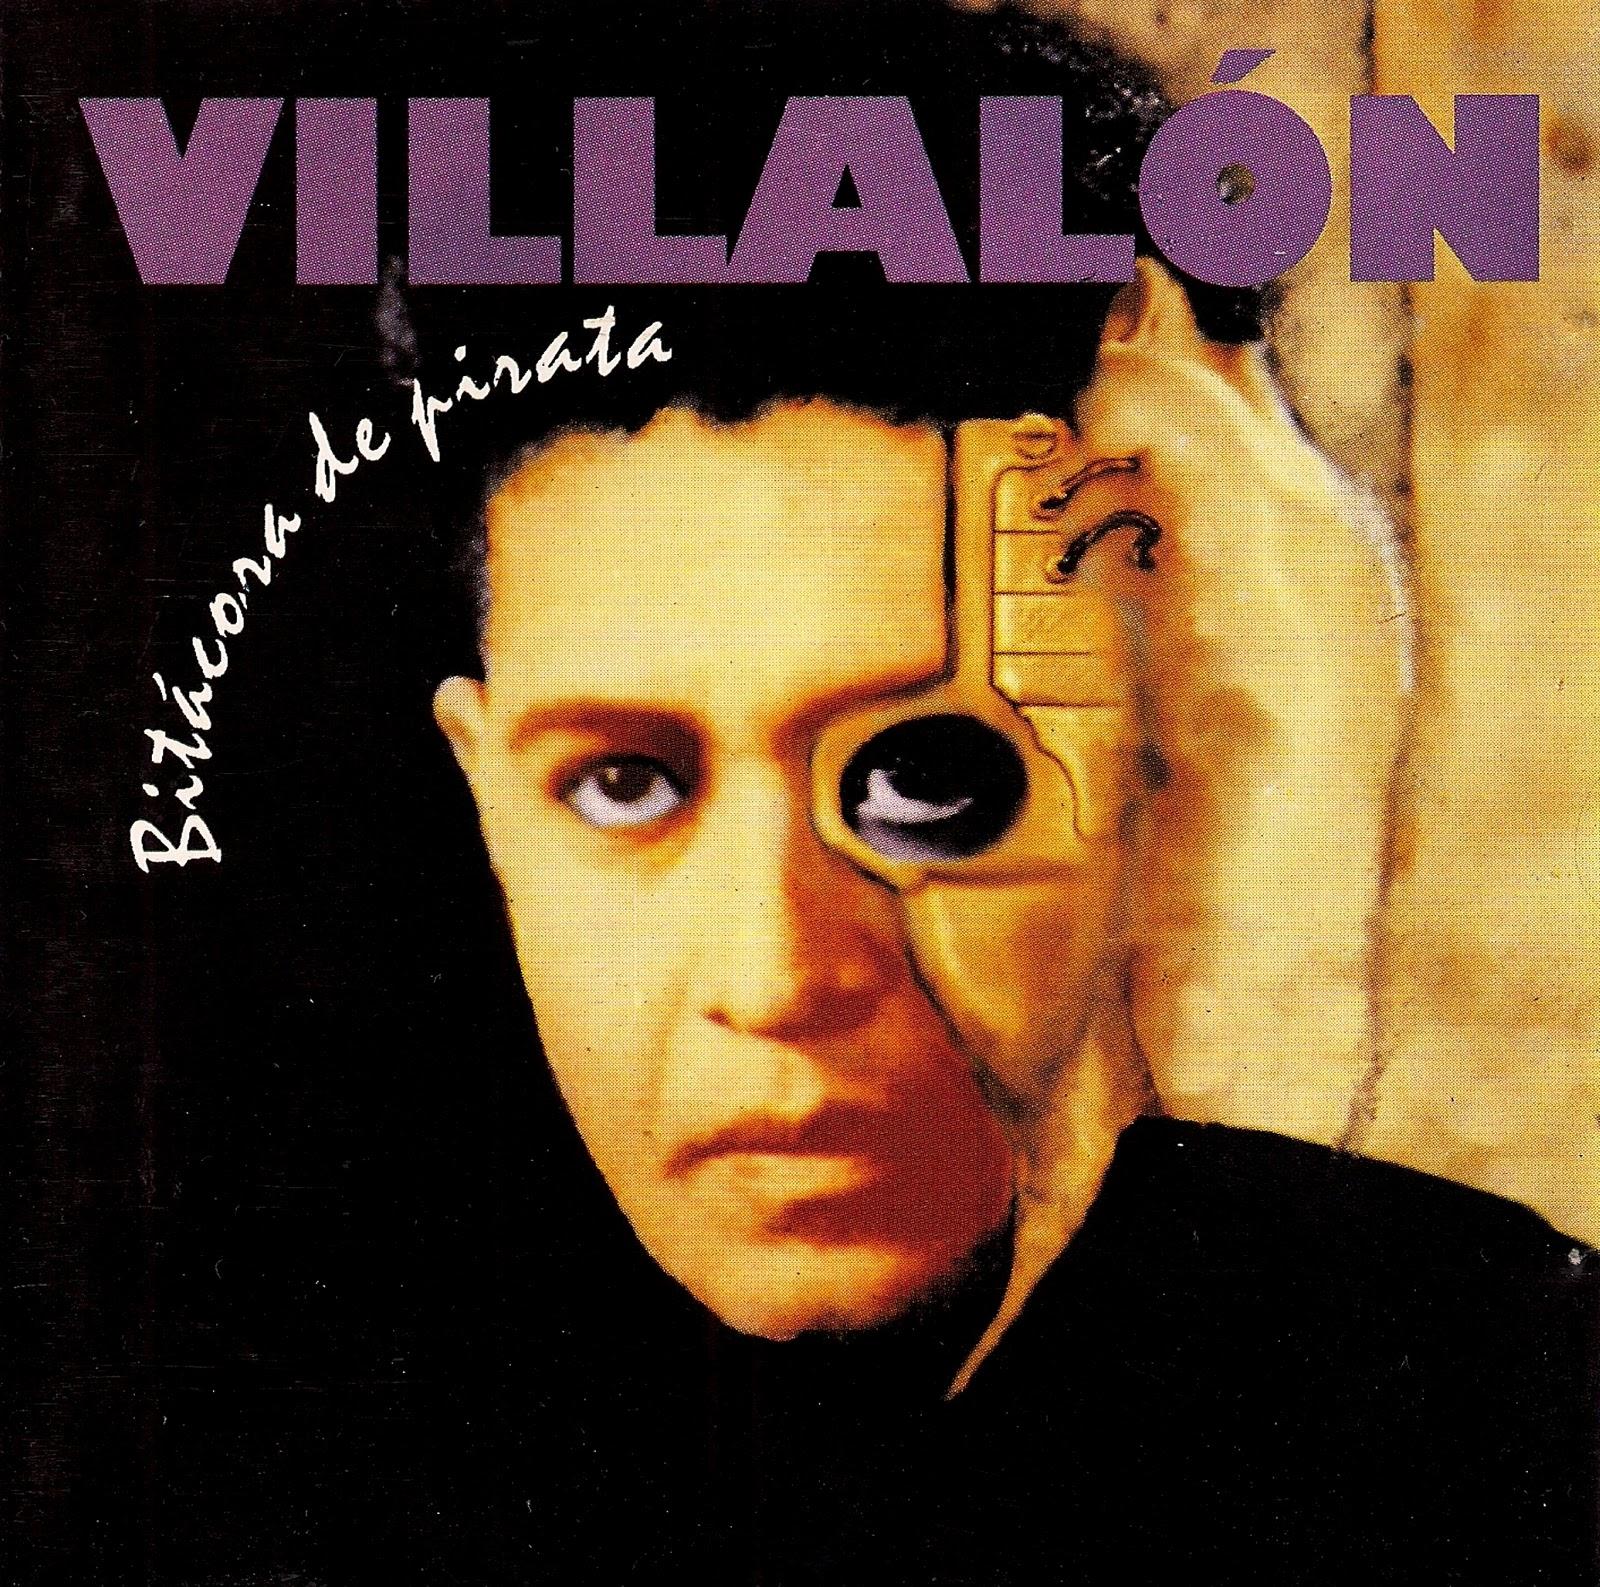 richard villalon discografia